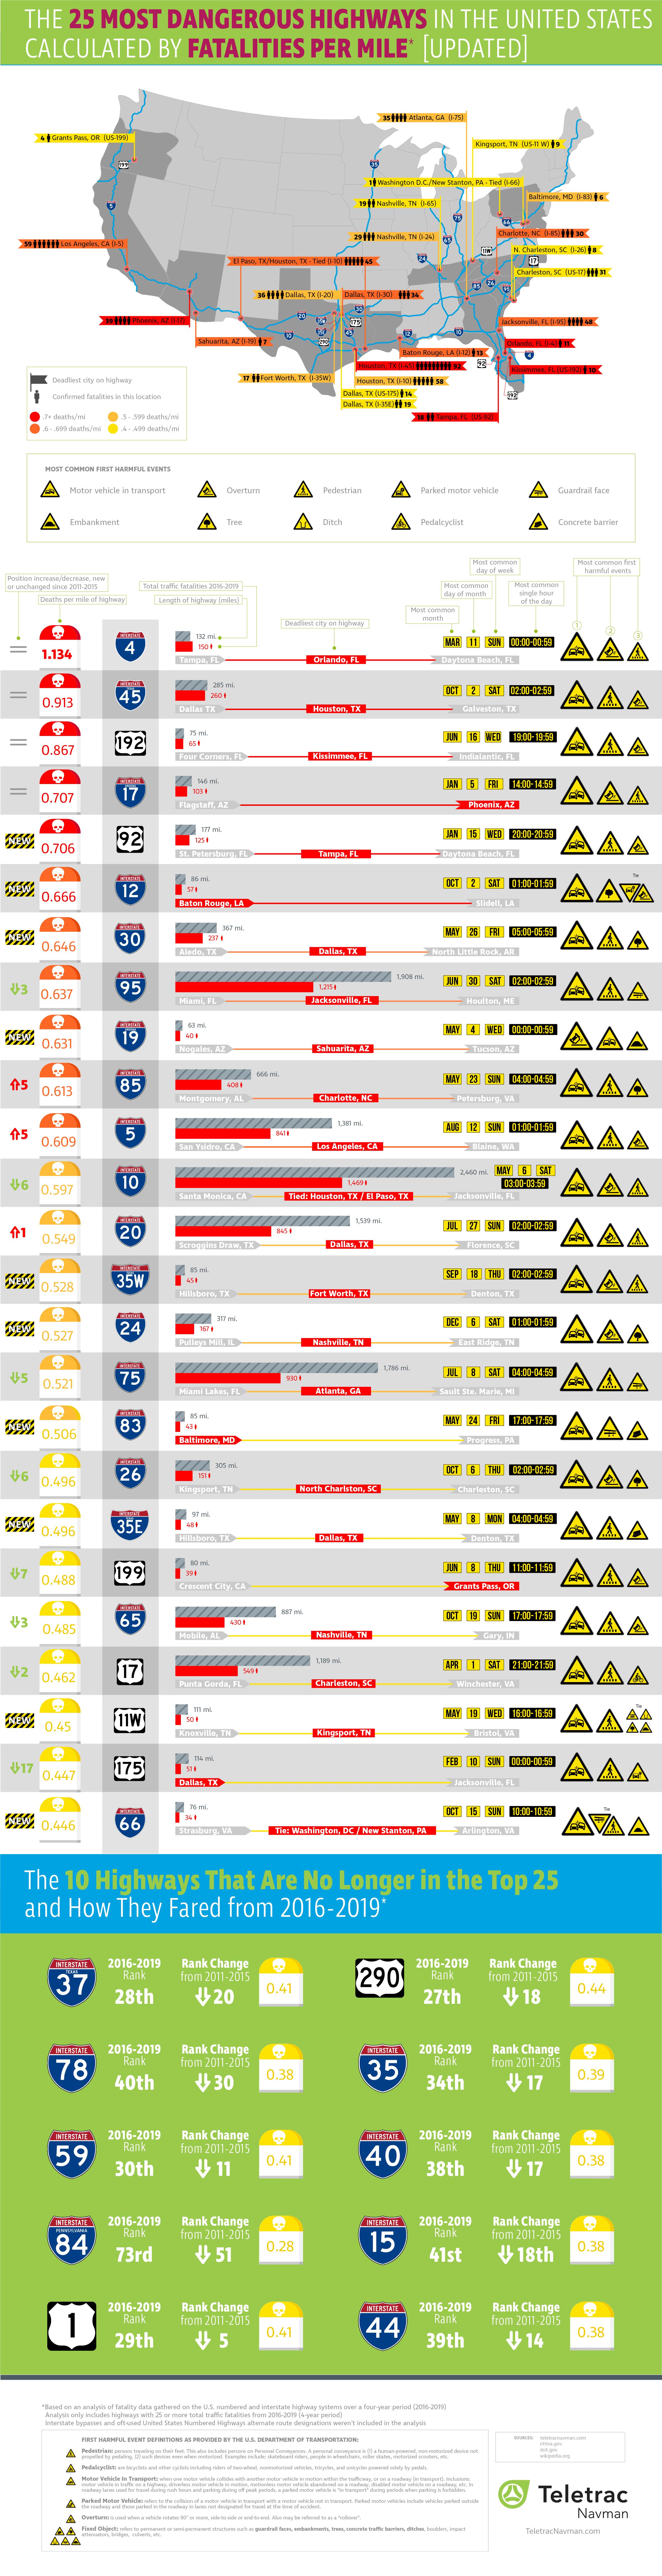 Most Dangerous Roads in America - TeletracNavman.com Infographic